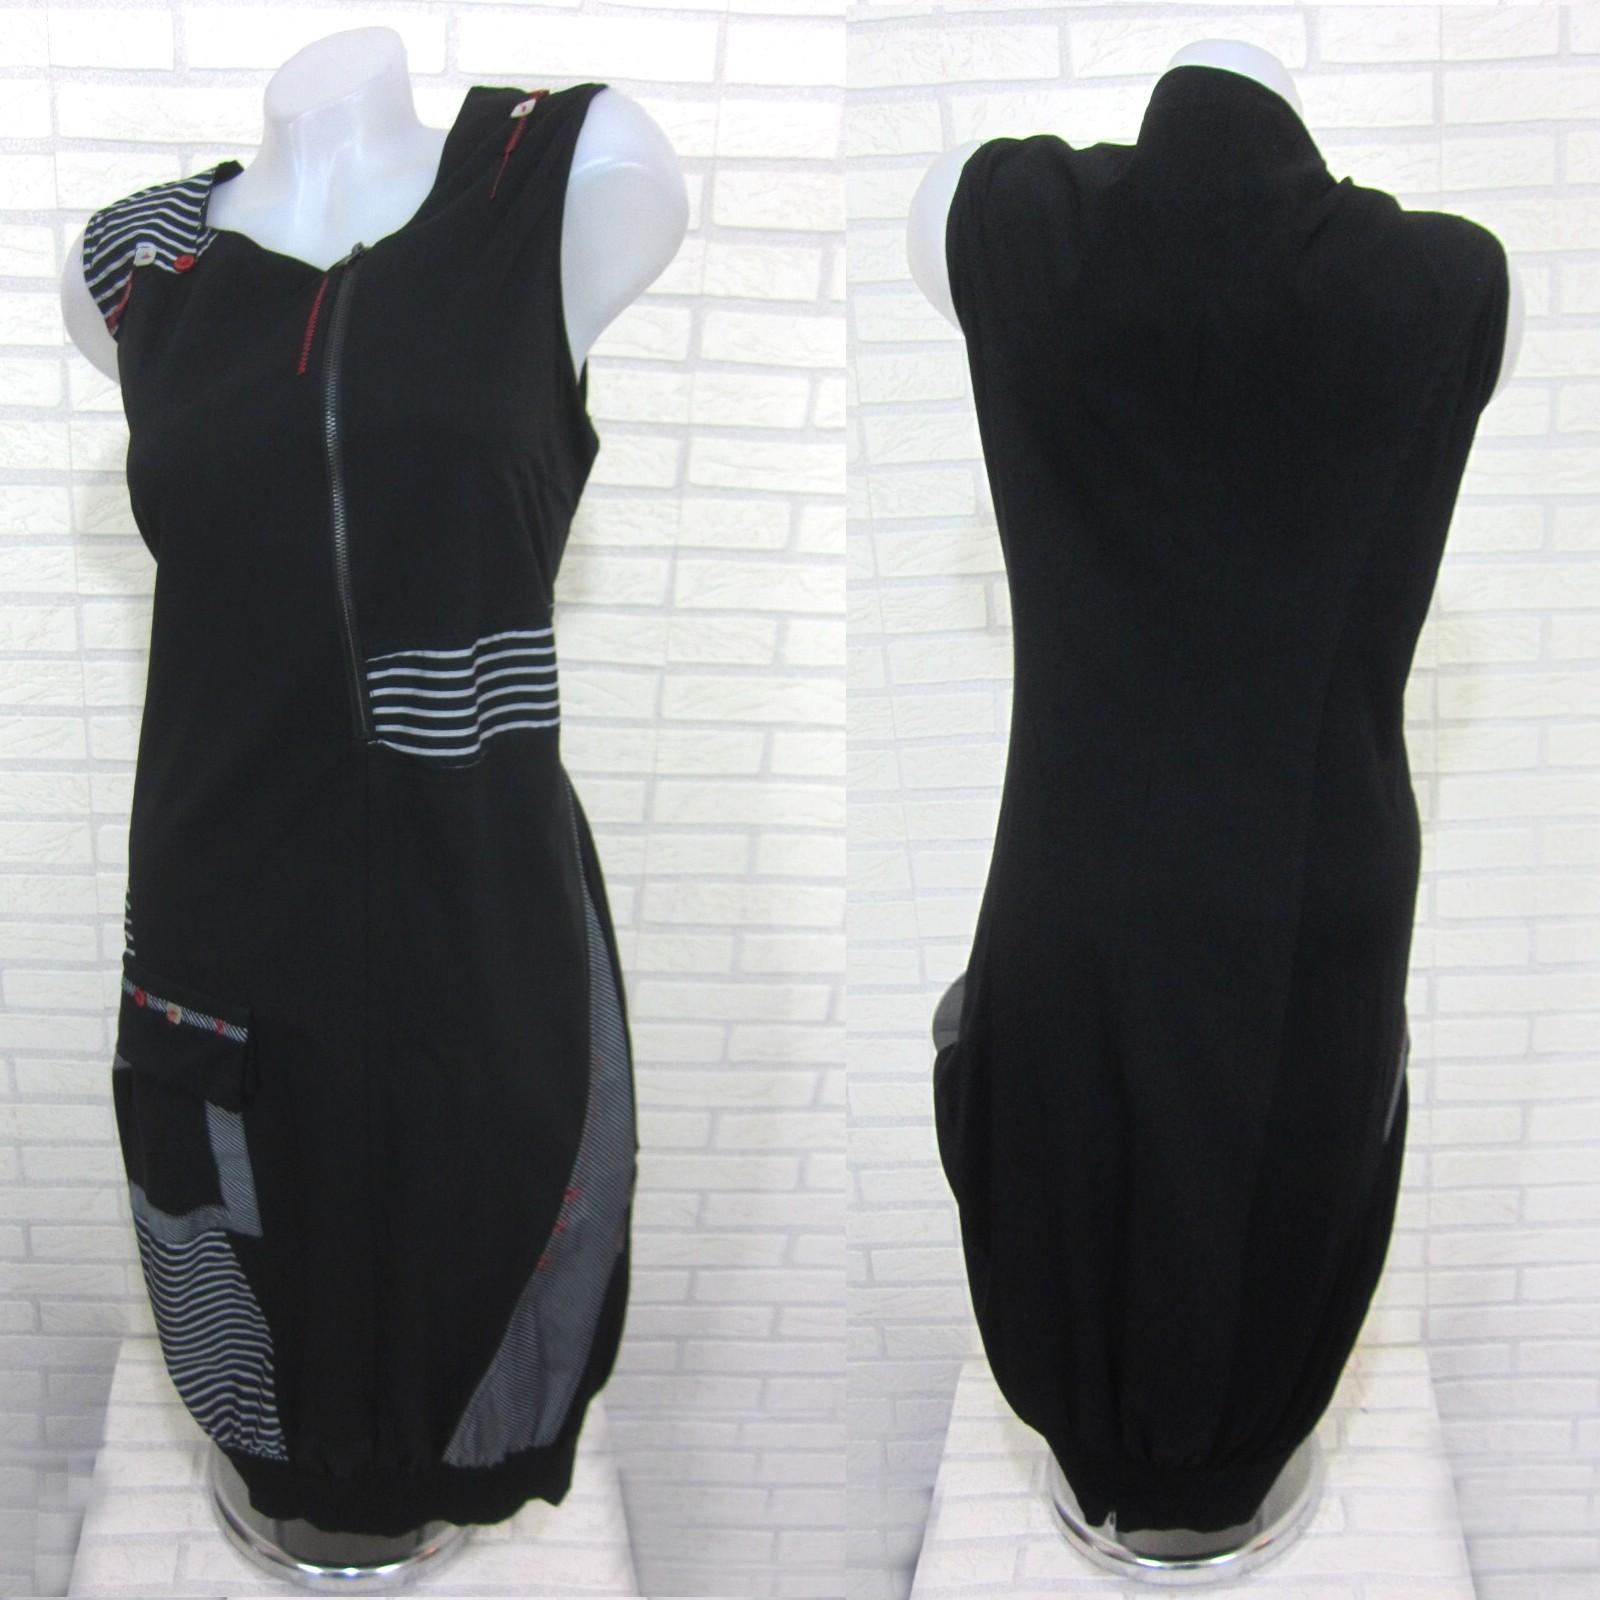 neu damen lagenlook tunika kleid longshirt h ngerchen. Black Bedroom Furniture Sets. Home Design Ideas